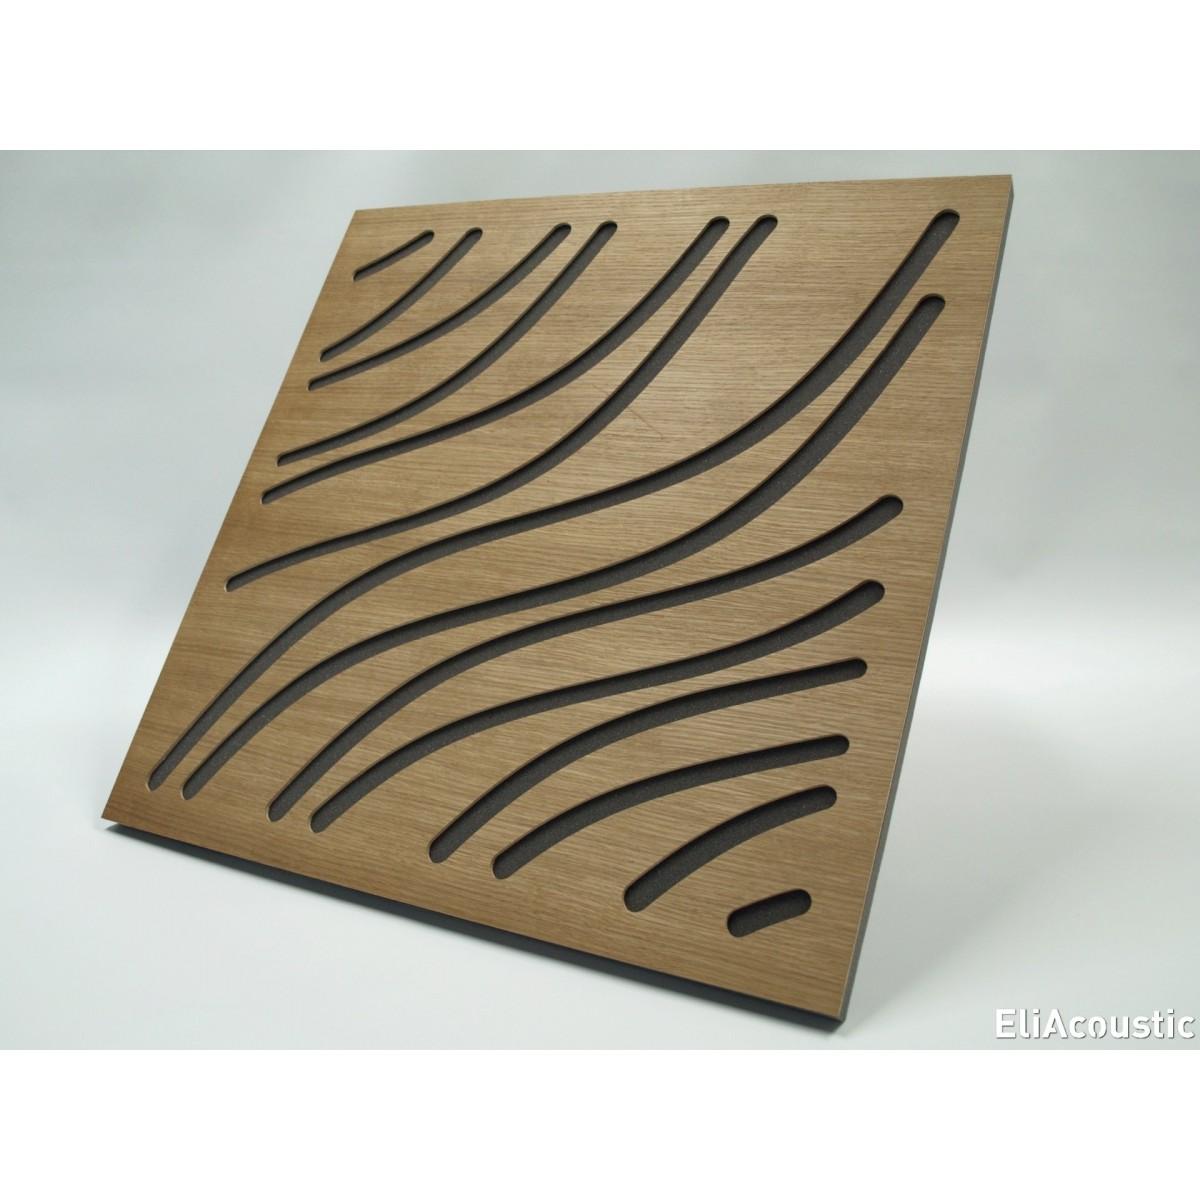 panel acustico de madera EliAcoustic Marine Slim Luxury.